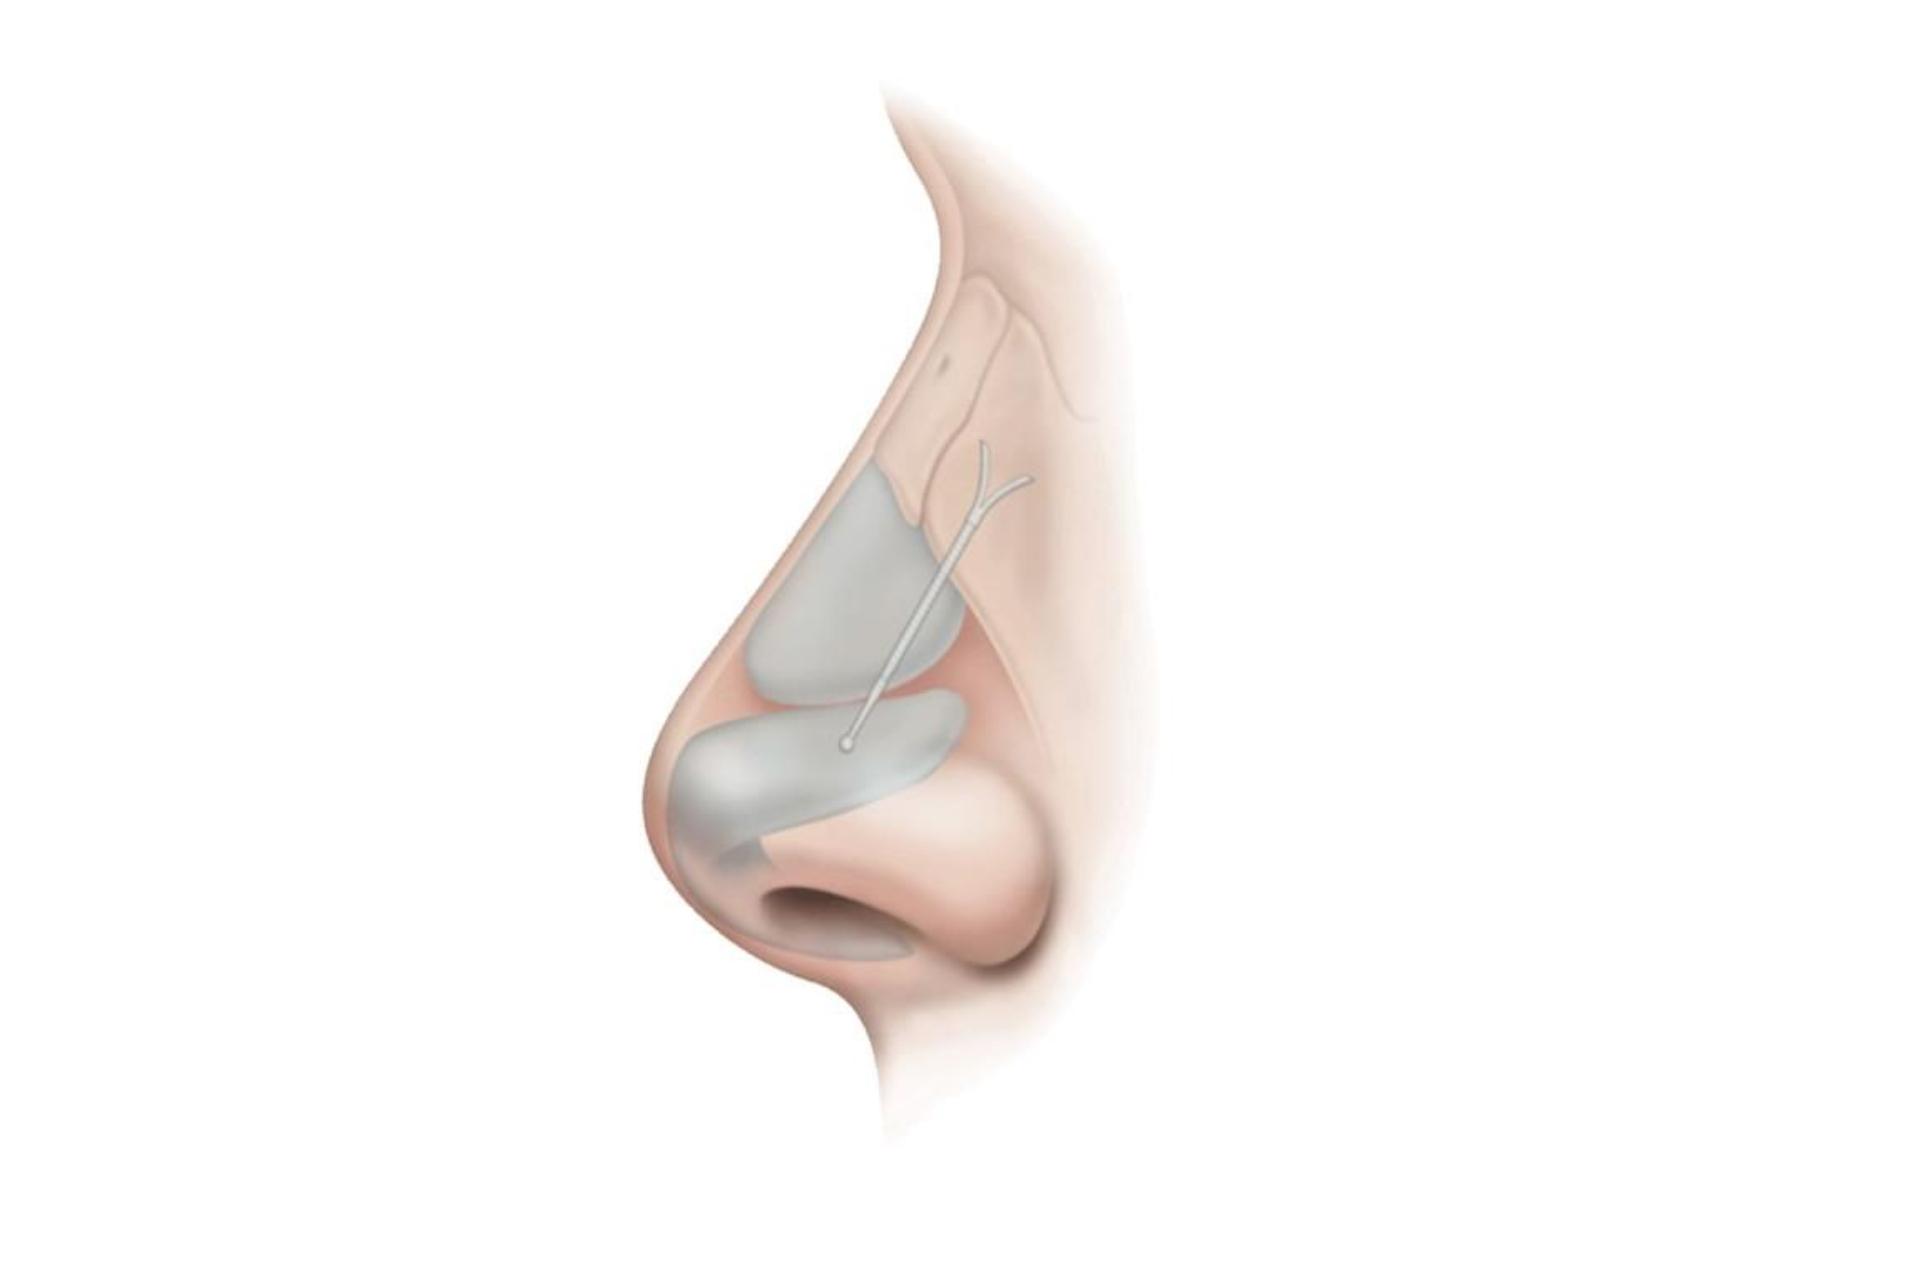 Nasal implant